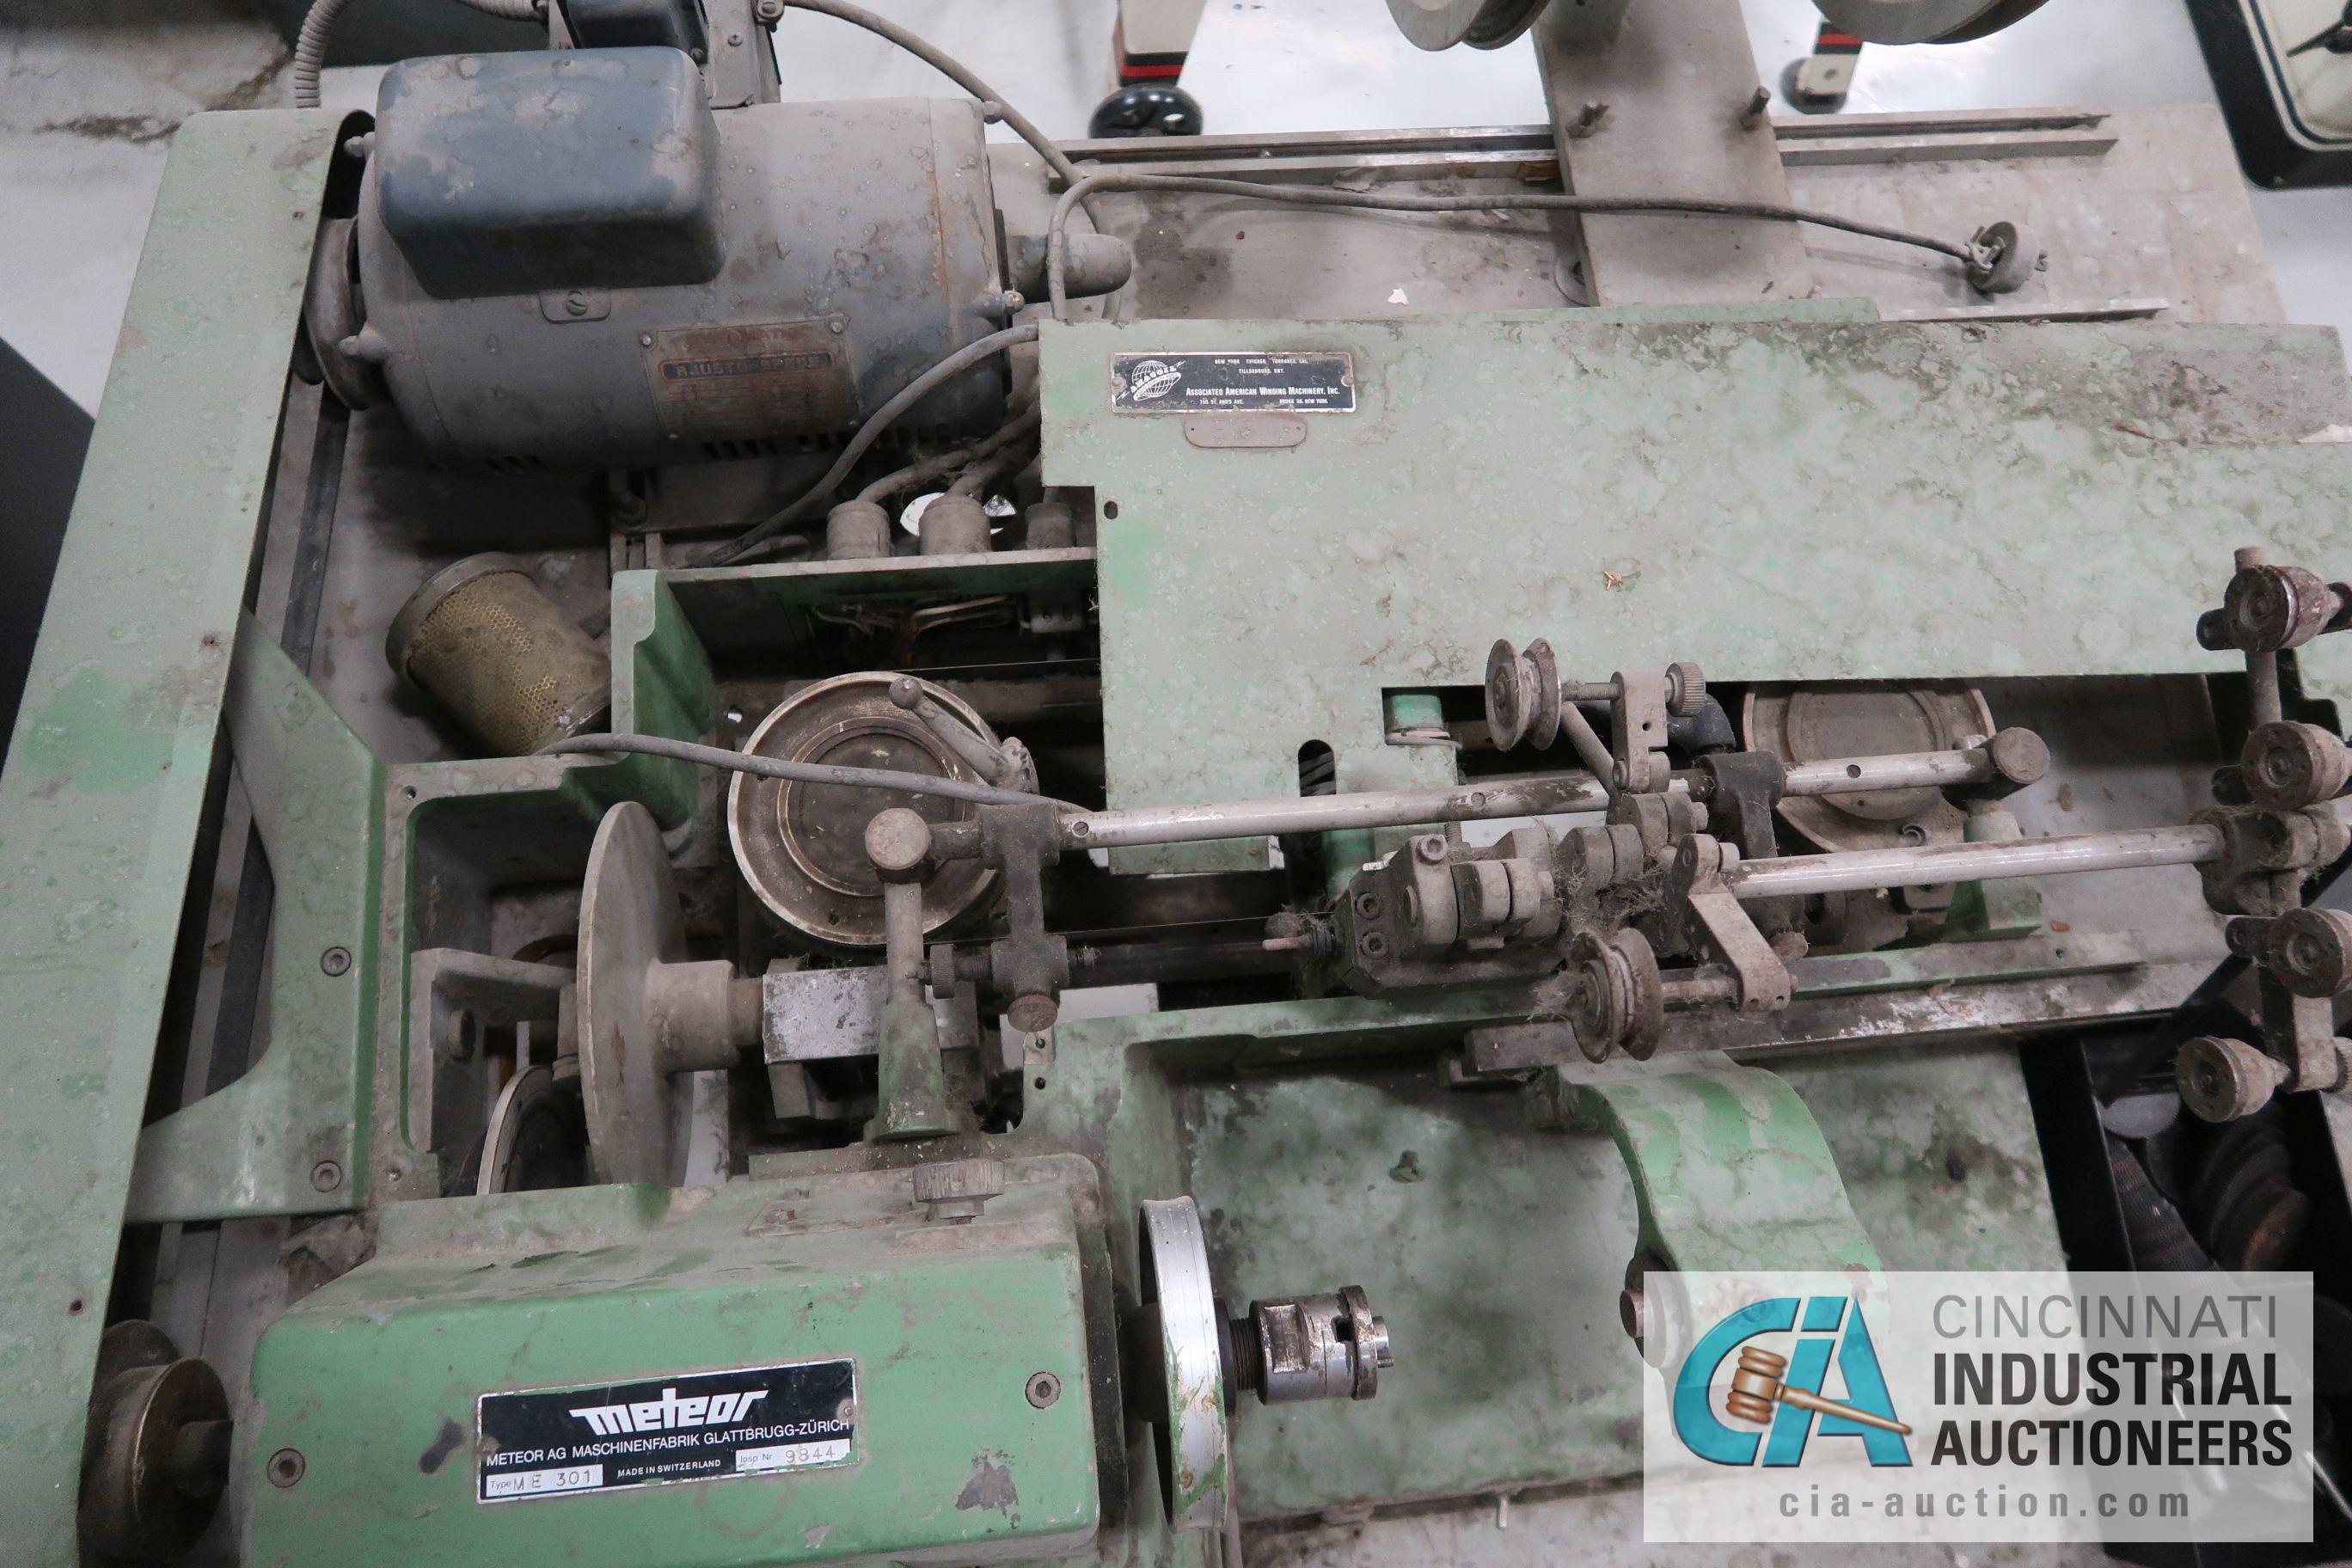 METEOR TYPE ME 301 BOBBIN WINDING MACHINE; S/N 9844 - Image 4 of 5